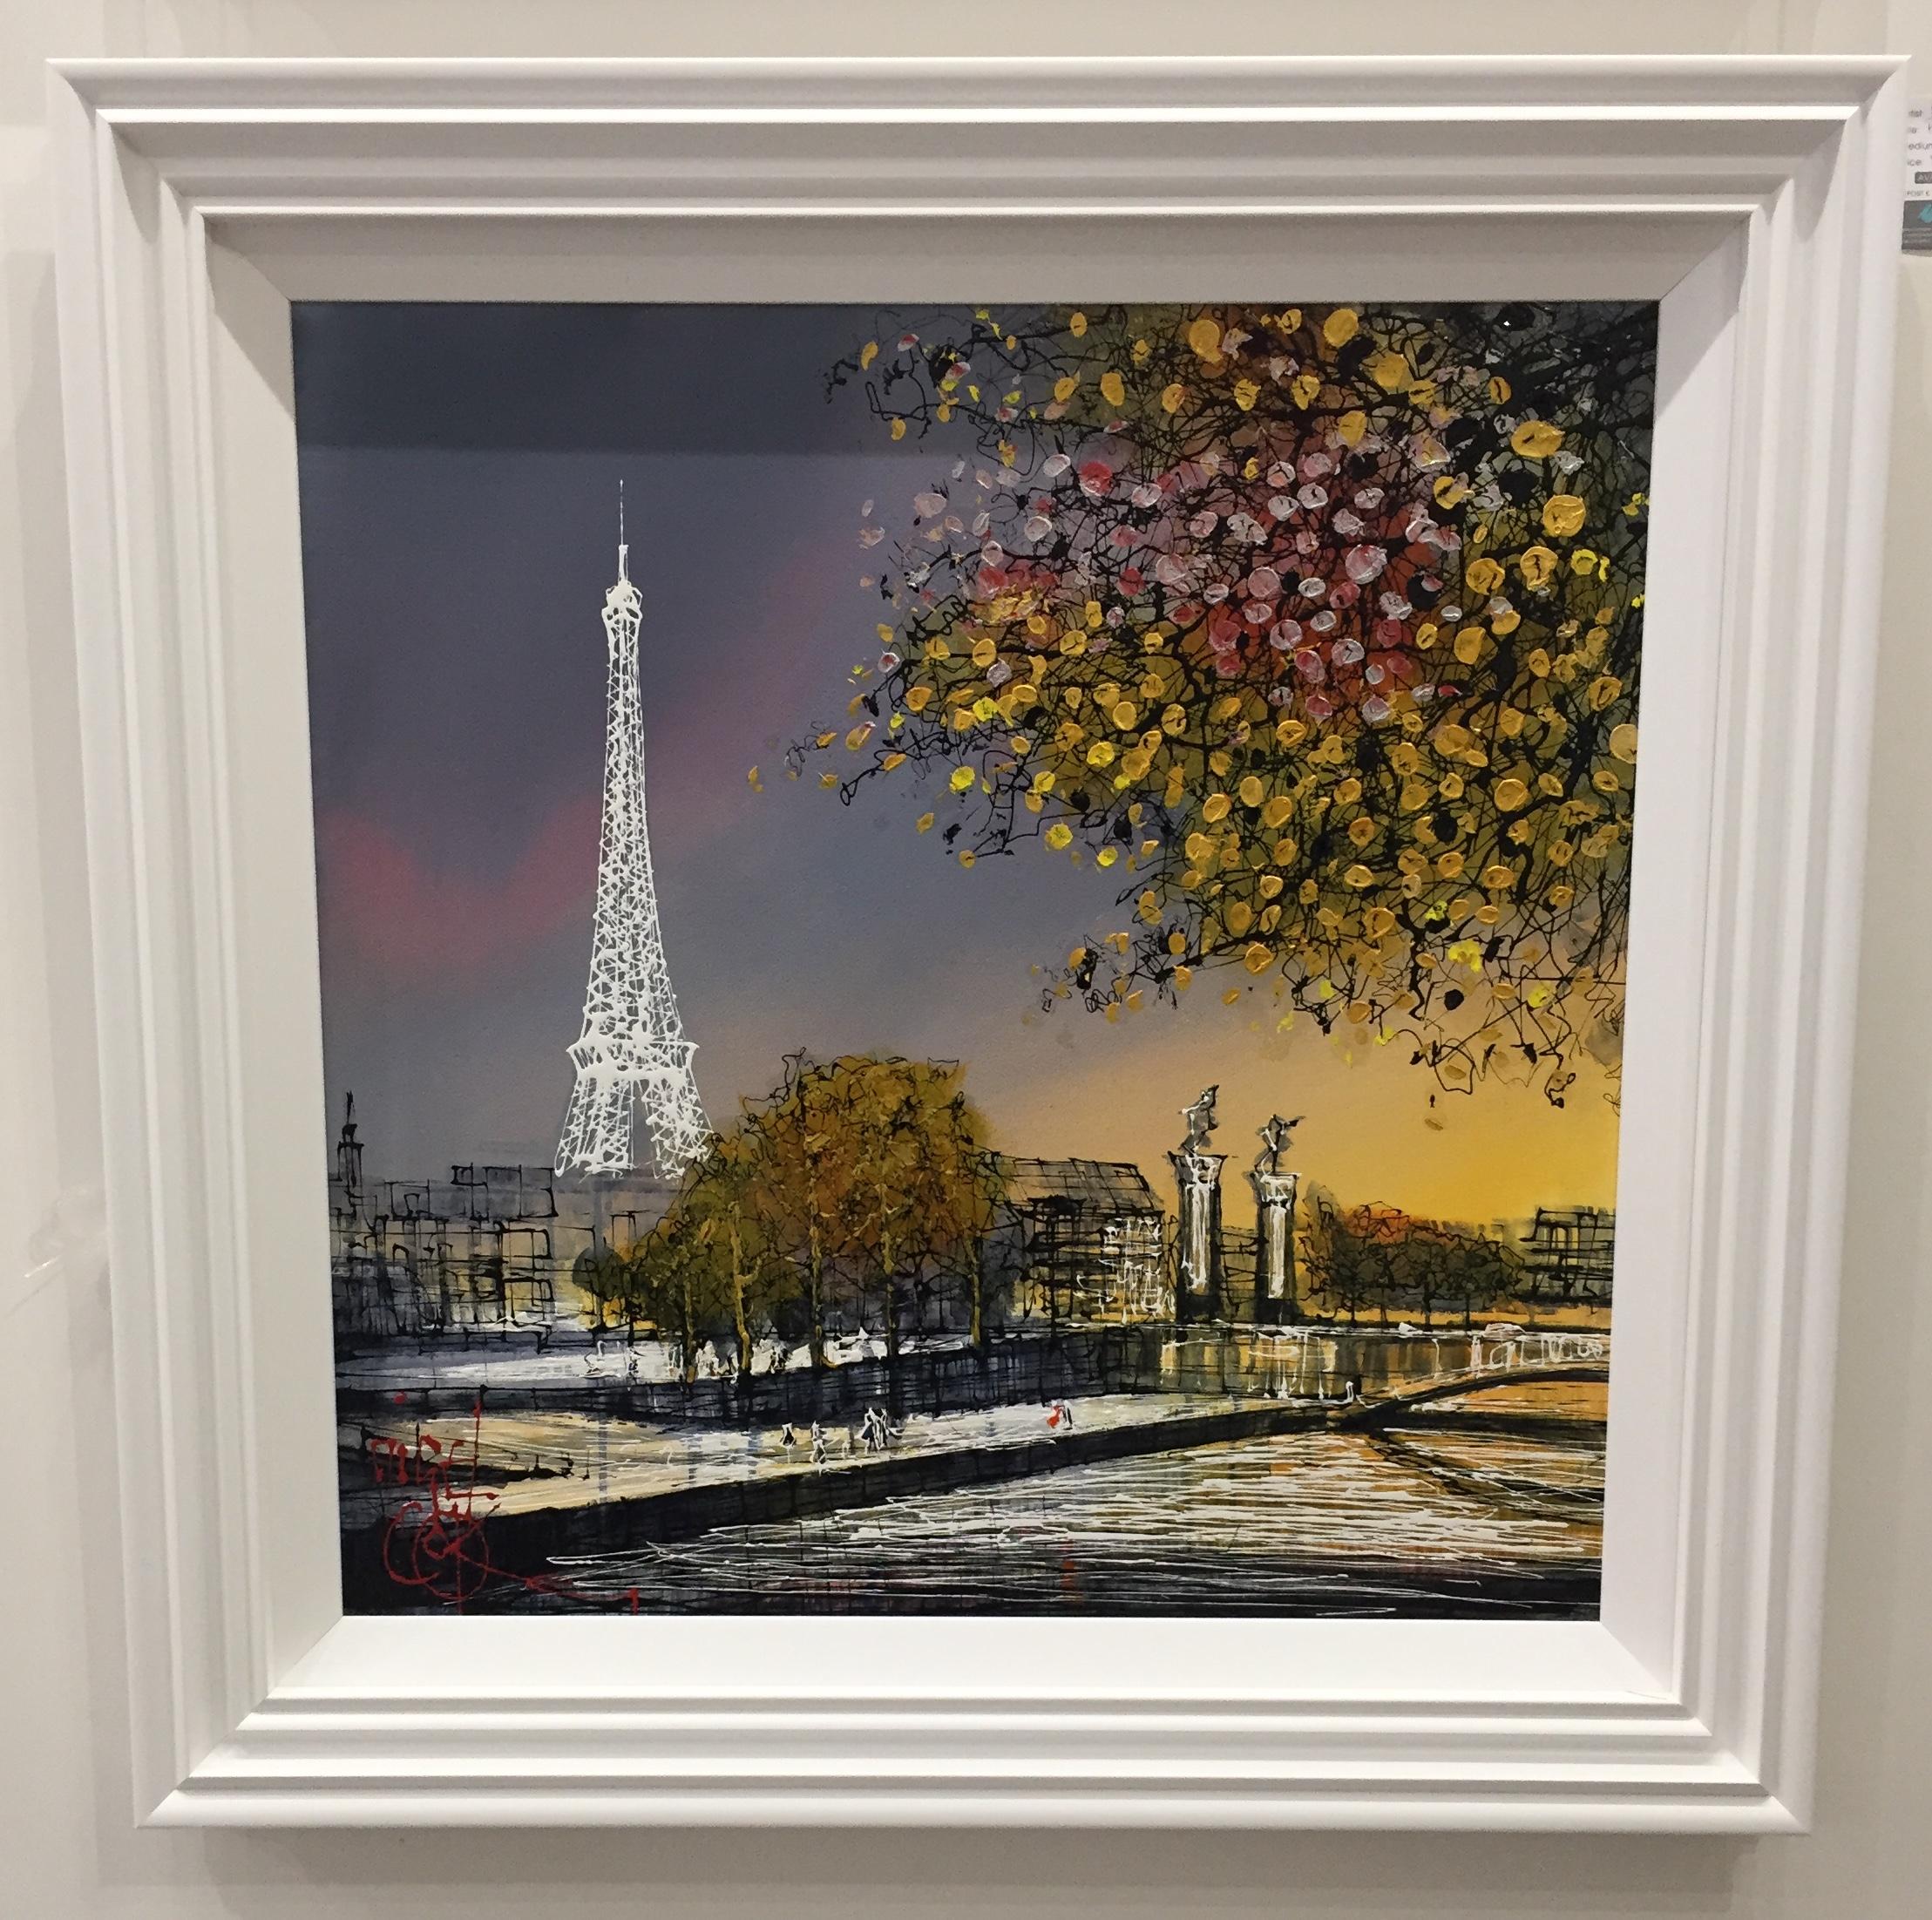 Paris In Autumn by Nigel Cooke